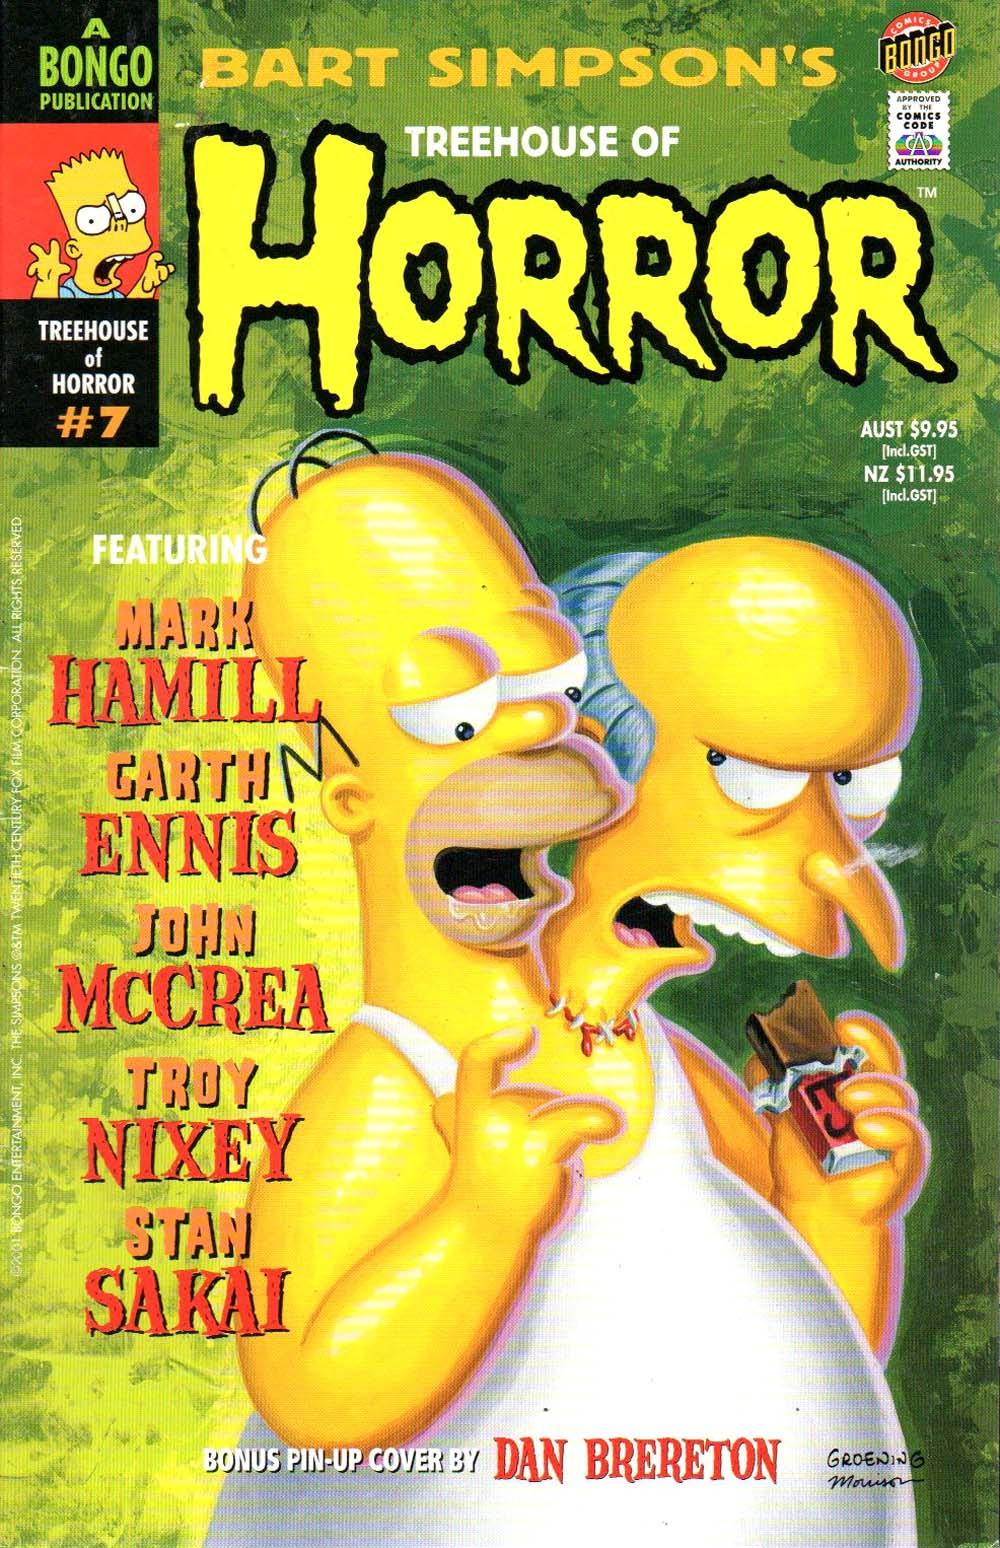 Bart Simpson's Treehouse of Horror (AU) 7 (2).jpg